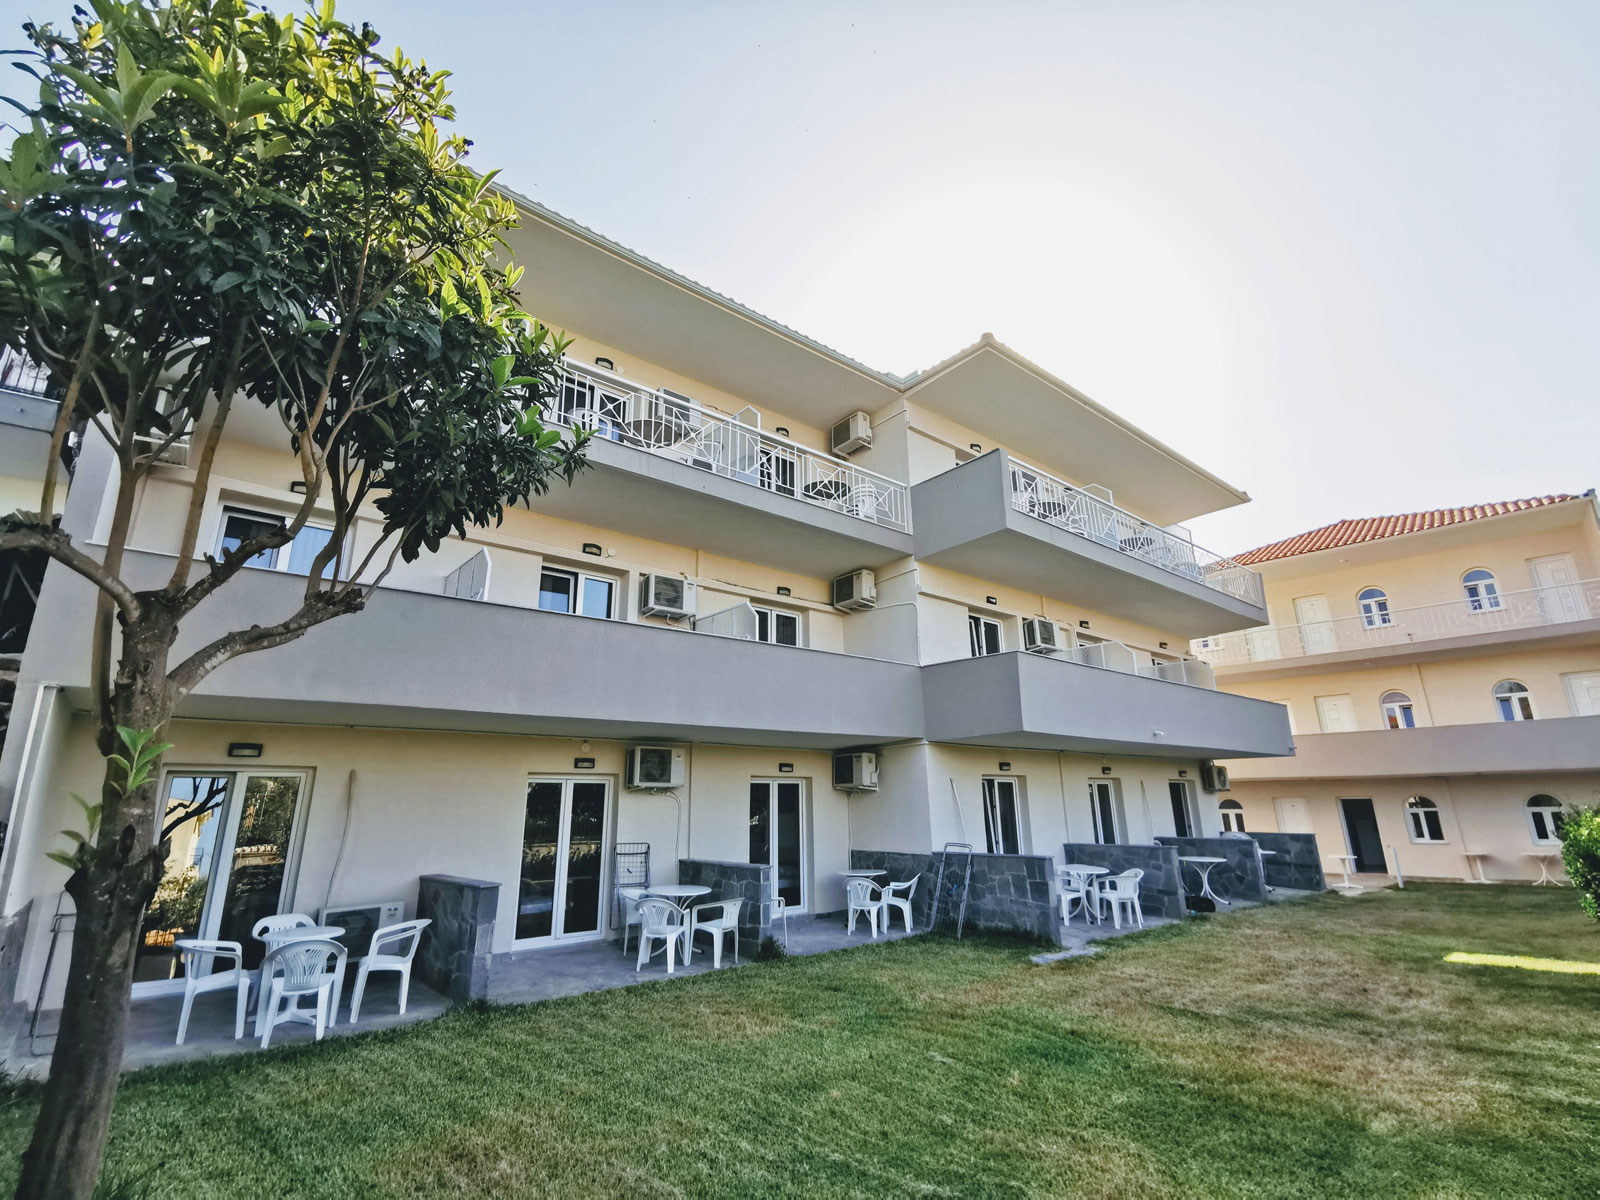 Grcka apartmani letovanje, Polihrono Halkidiki, Green Gardens, kuća B, travnjak ispred kuće